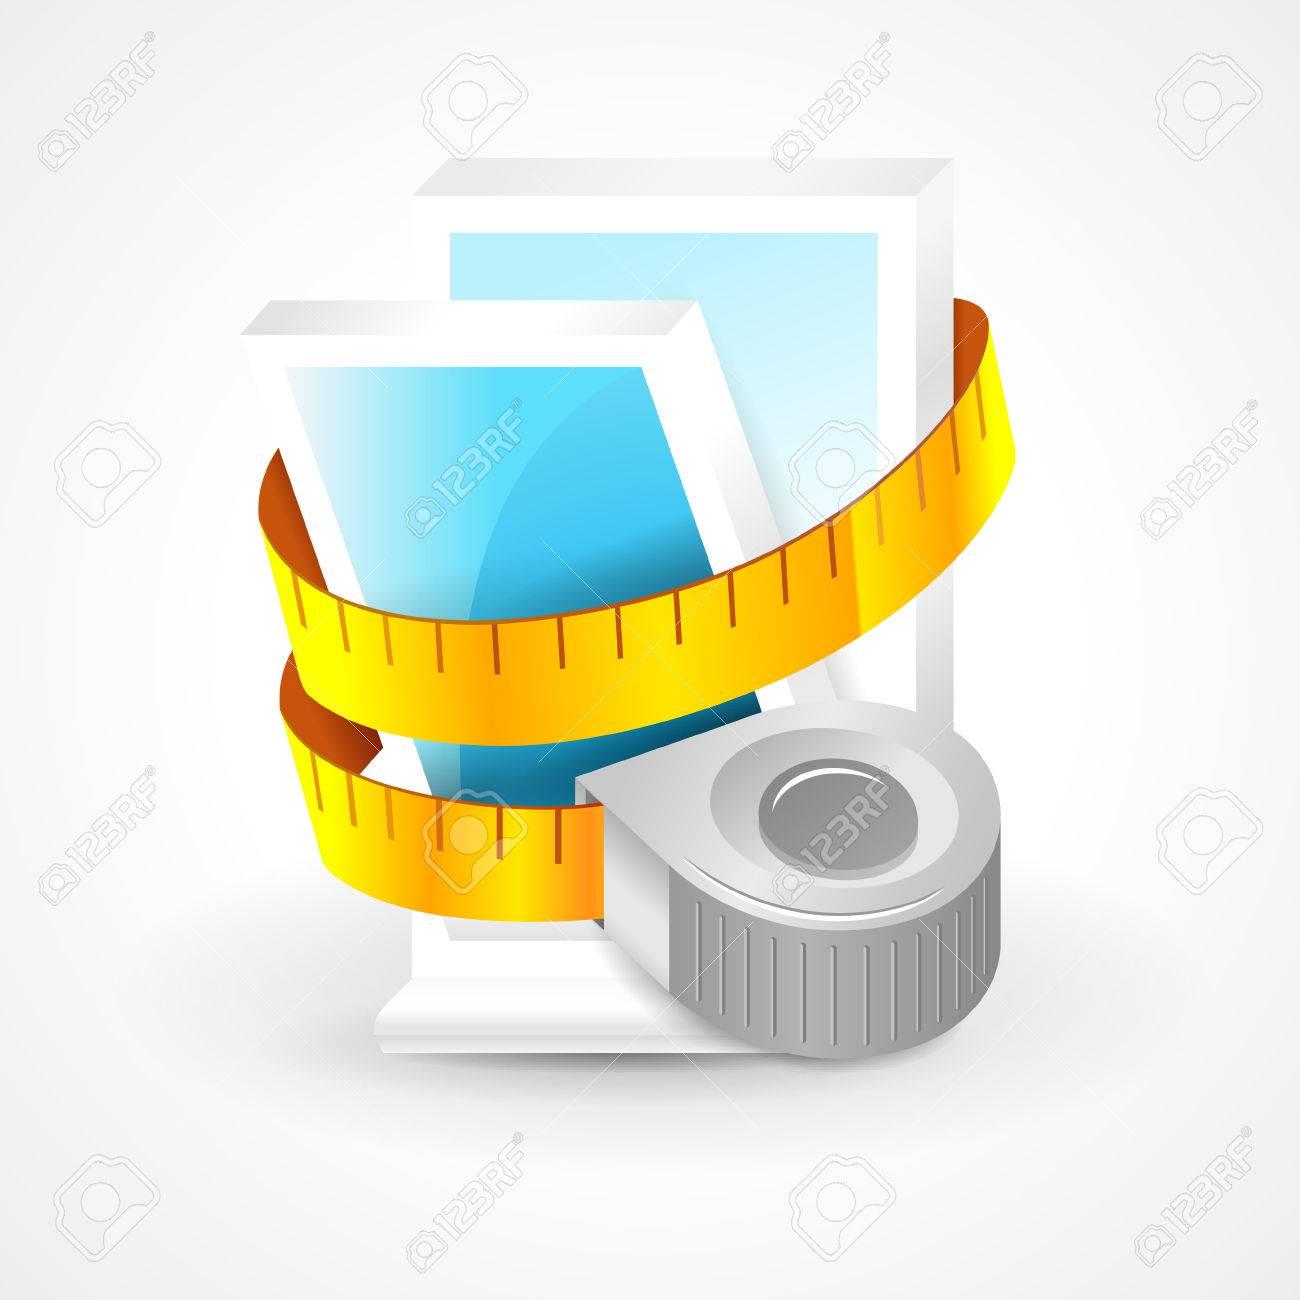 tape measure window plastic element icon - 55381070